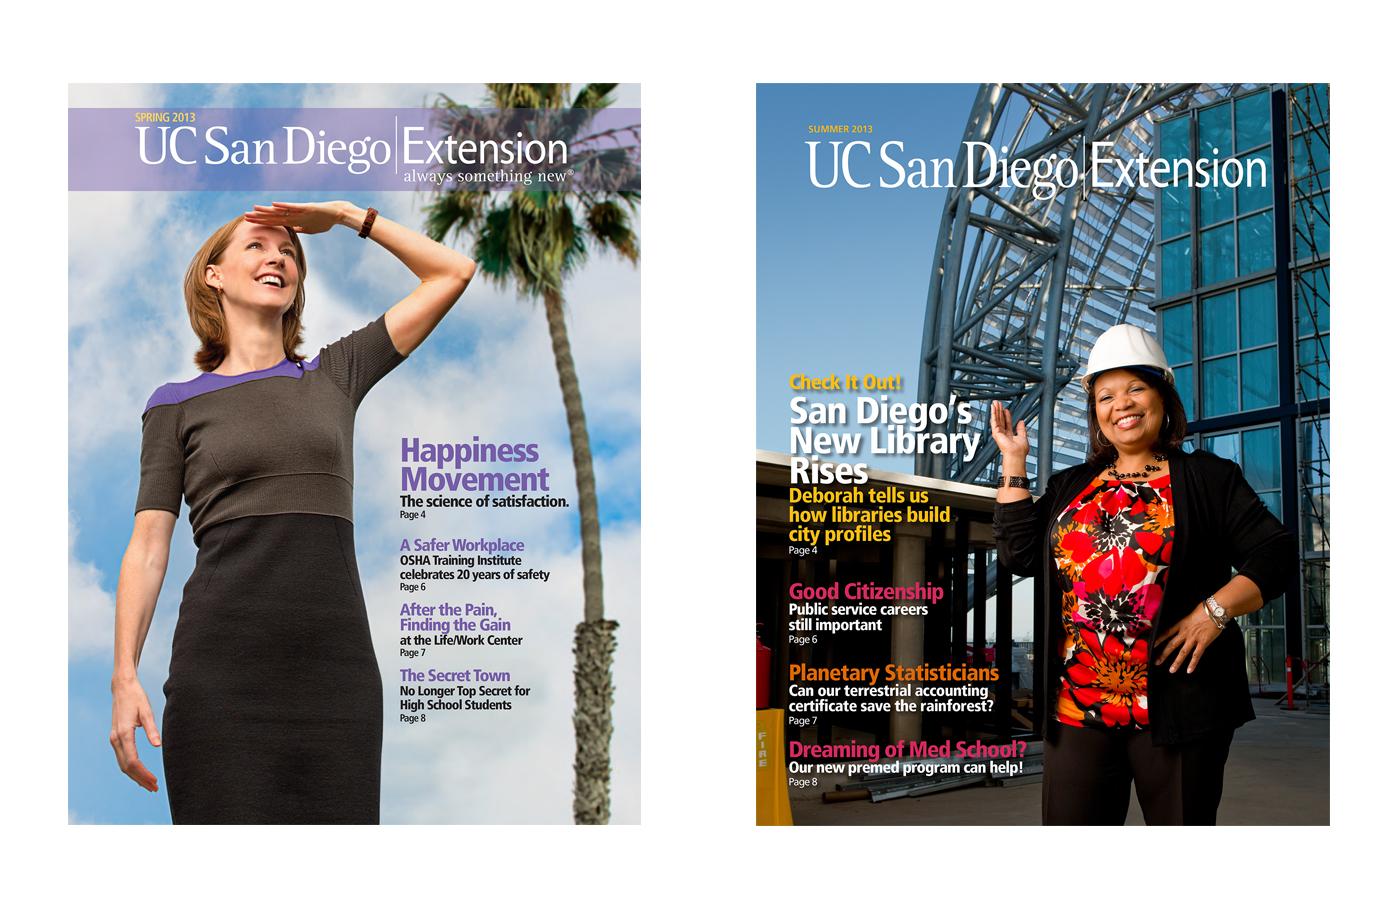 UCSD_Covers_3.jpg